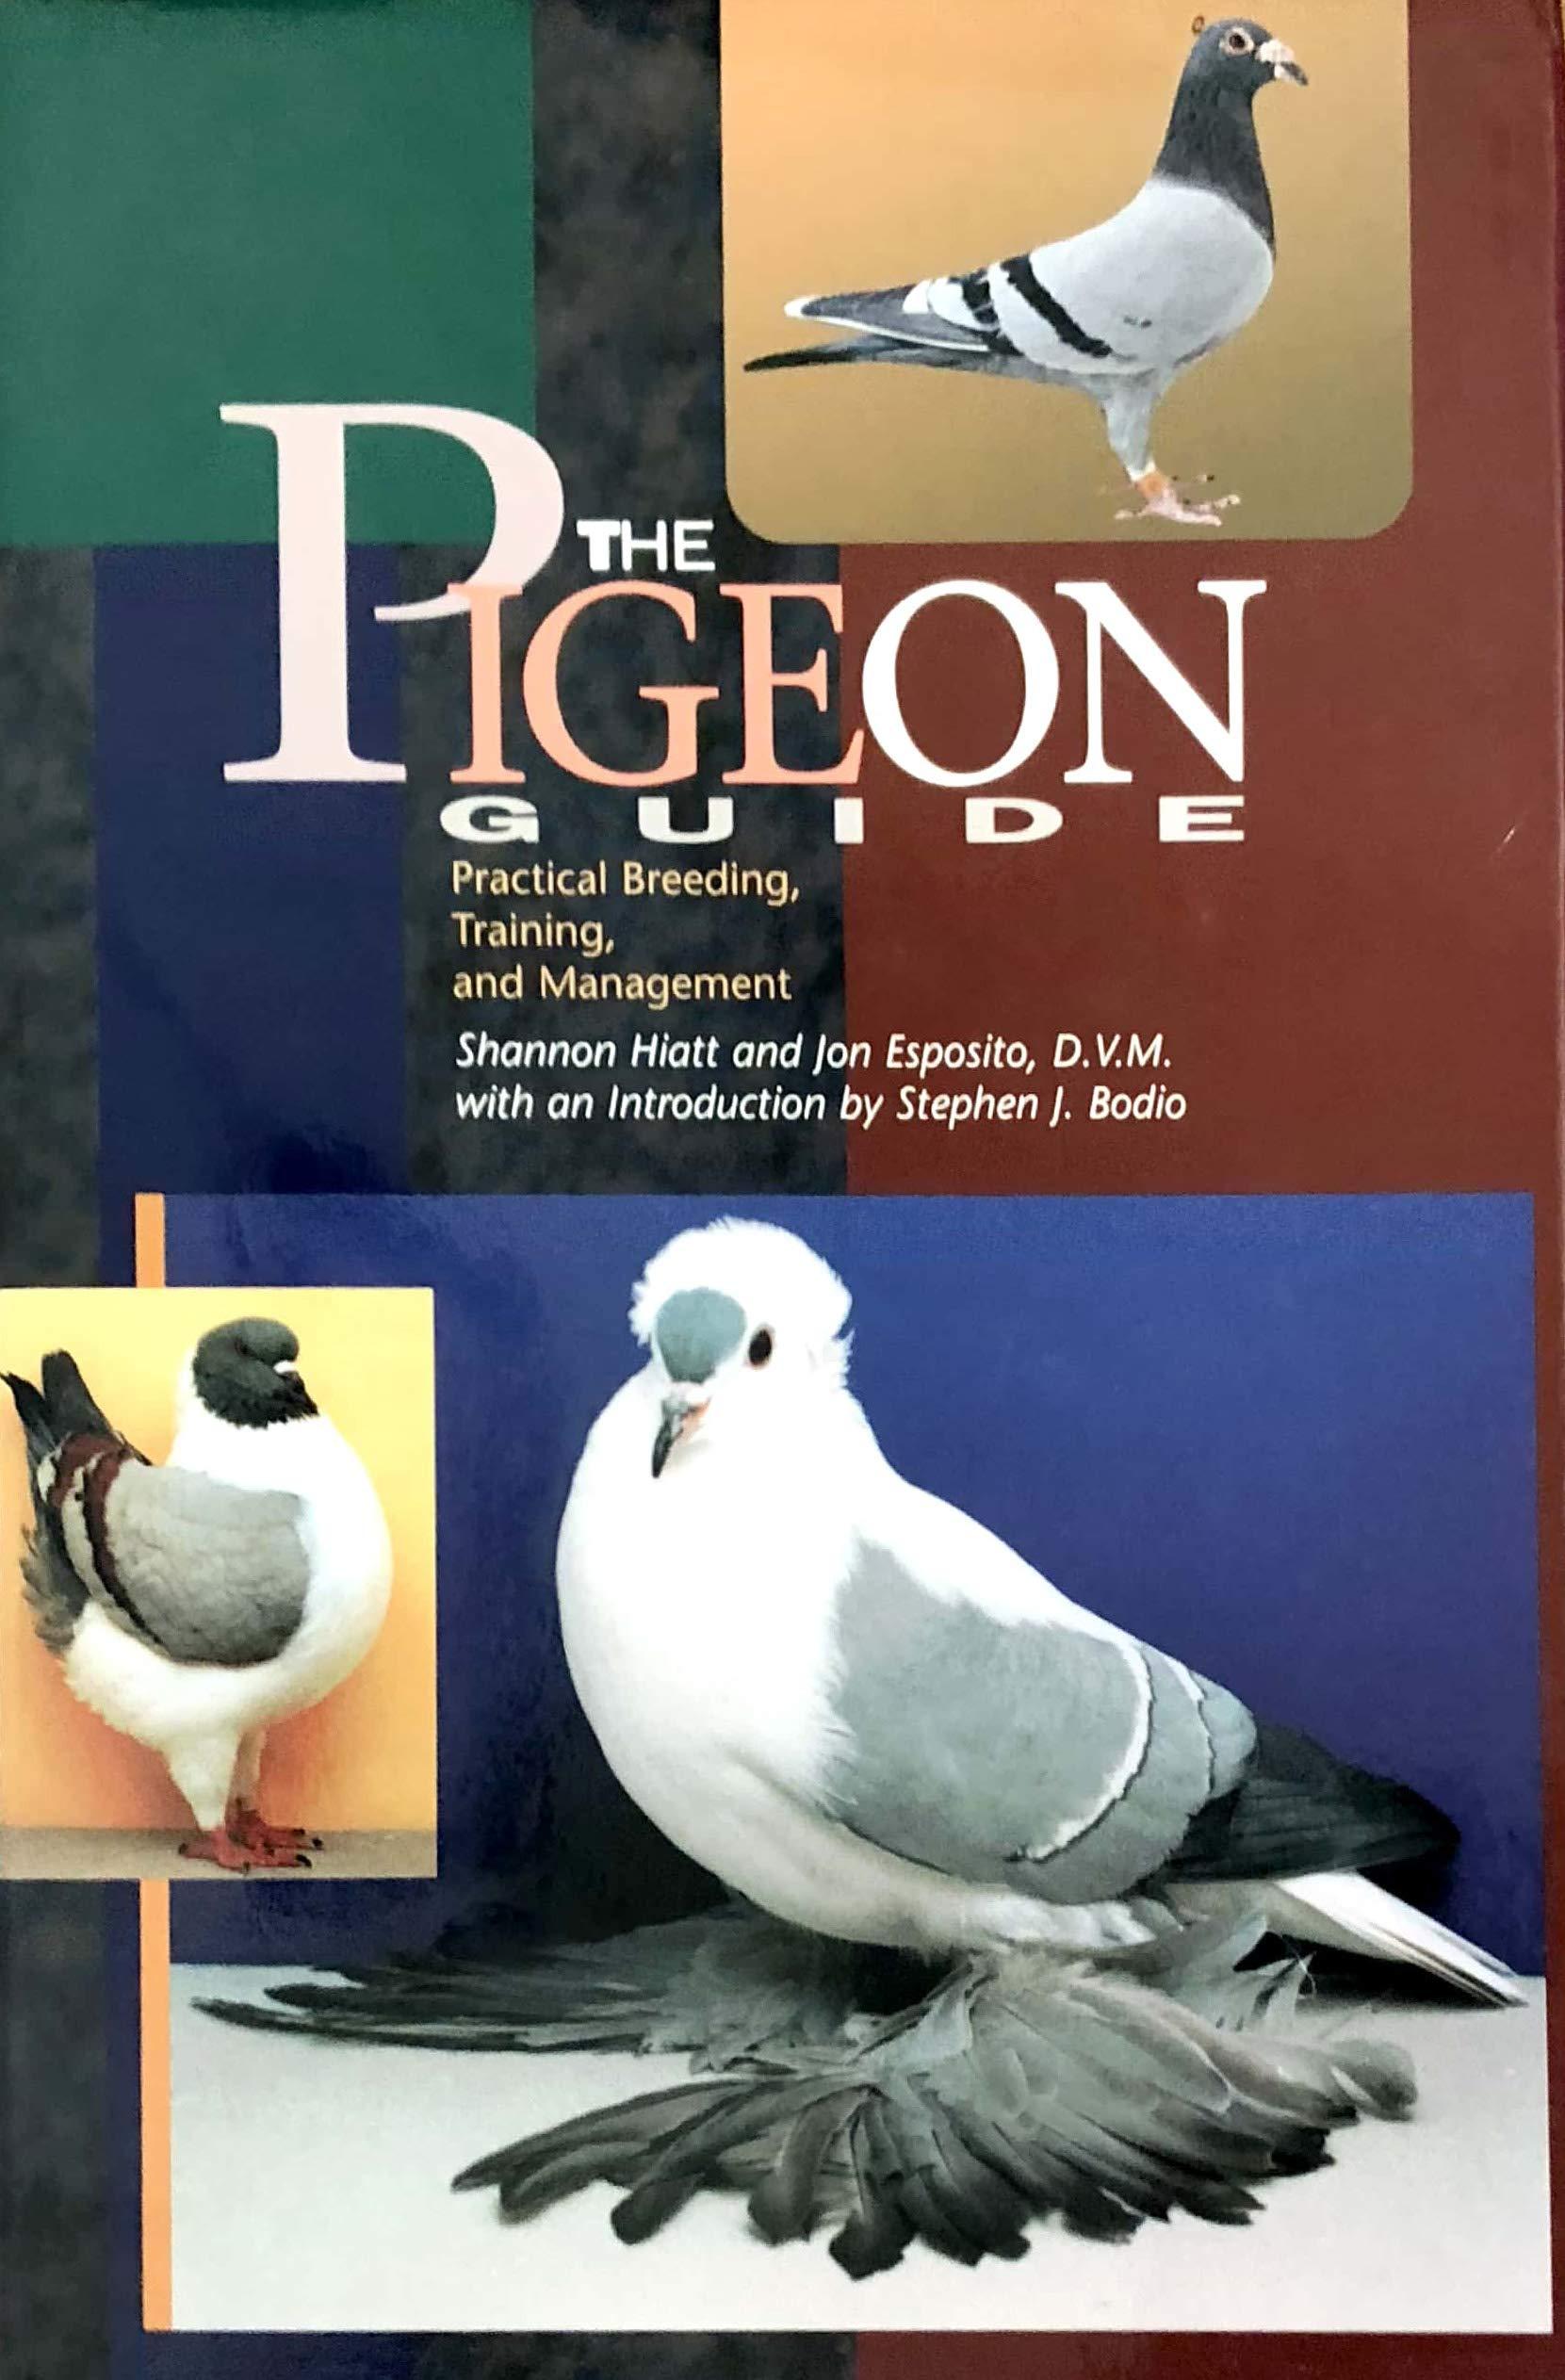 The Pigeon Guide: Practical Breeding Training and Management: Hiatt, Shannon, D.V.M., Dr. Jon Esposito, Nuez, George De La: 9781895270181: Amazon.com: Books